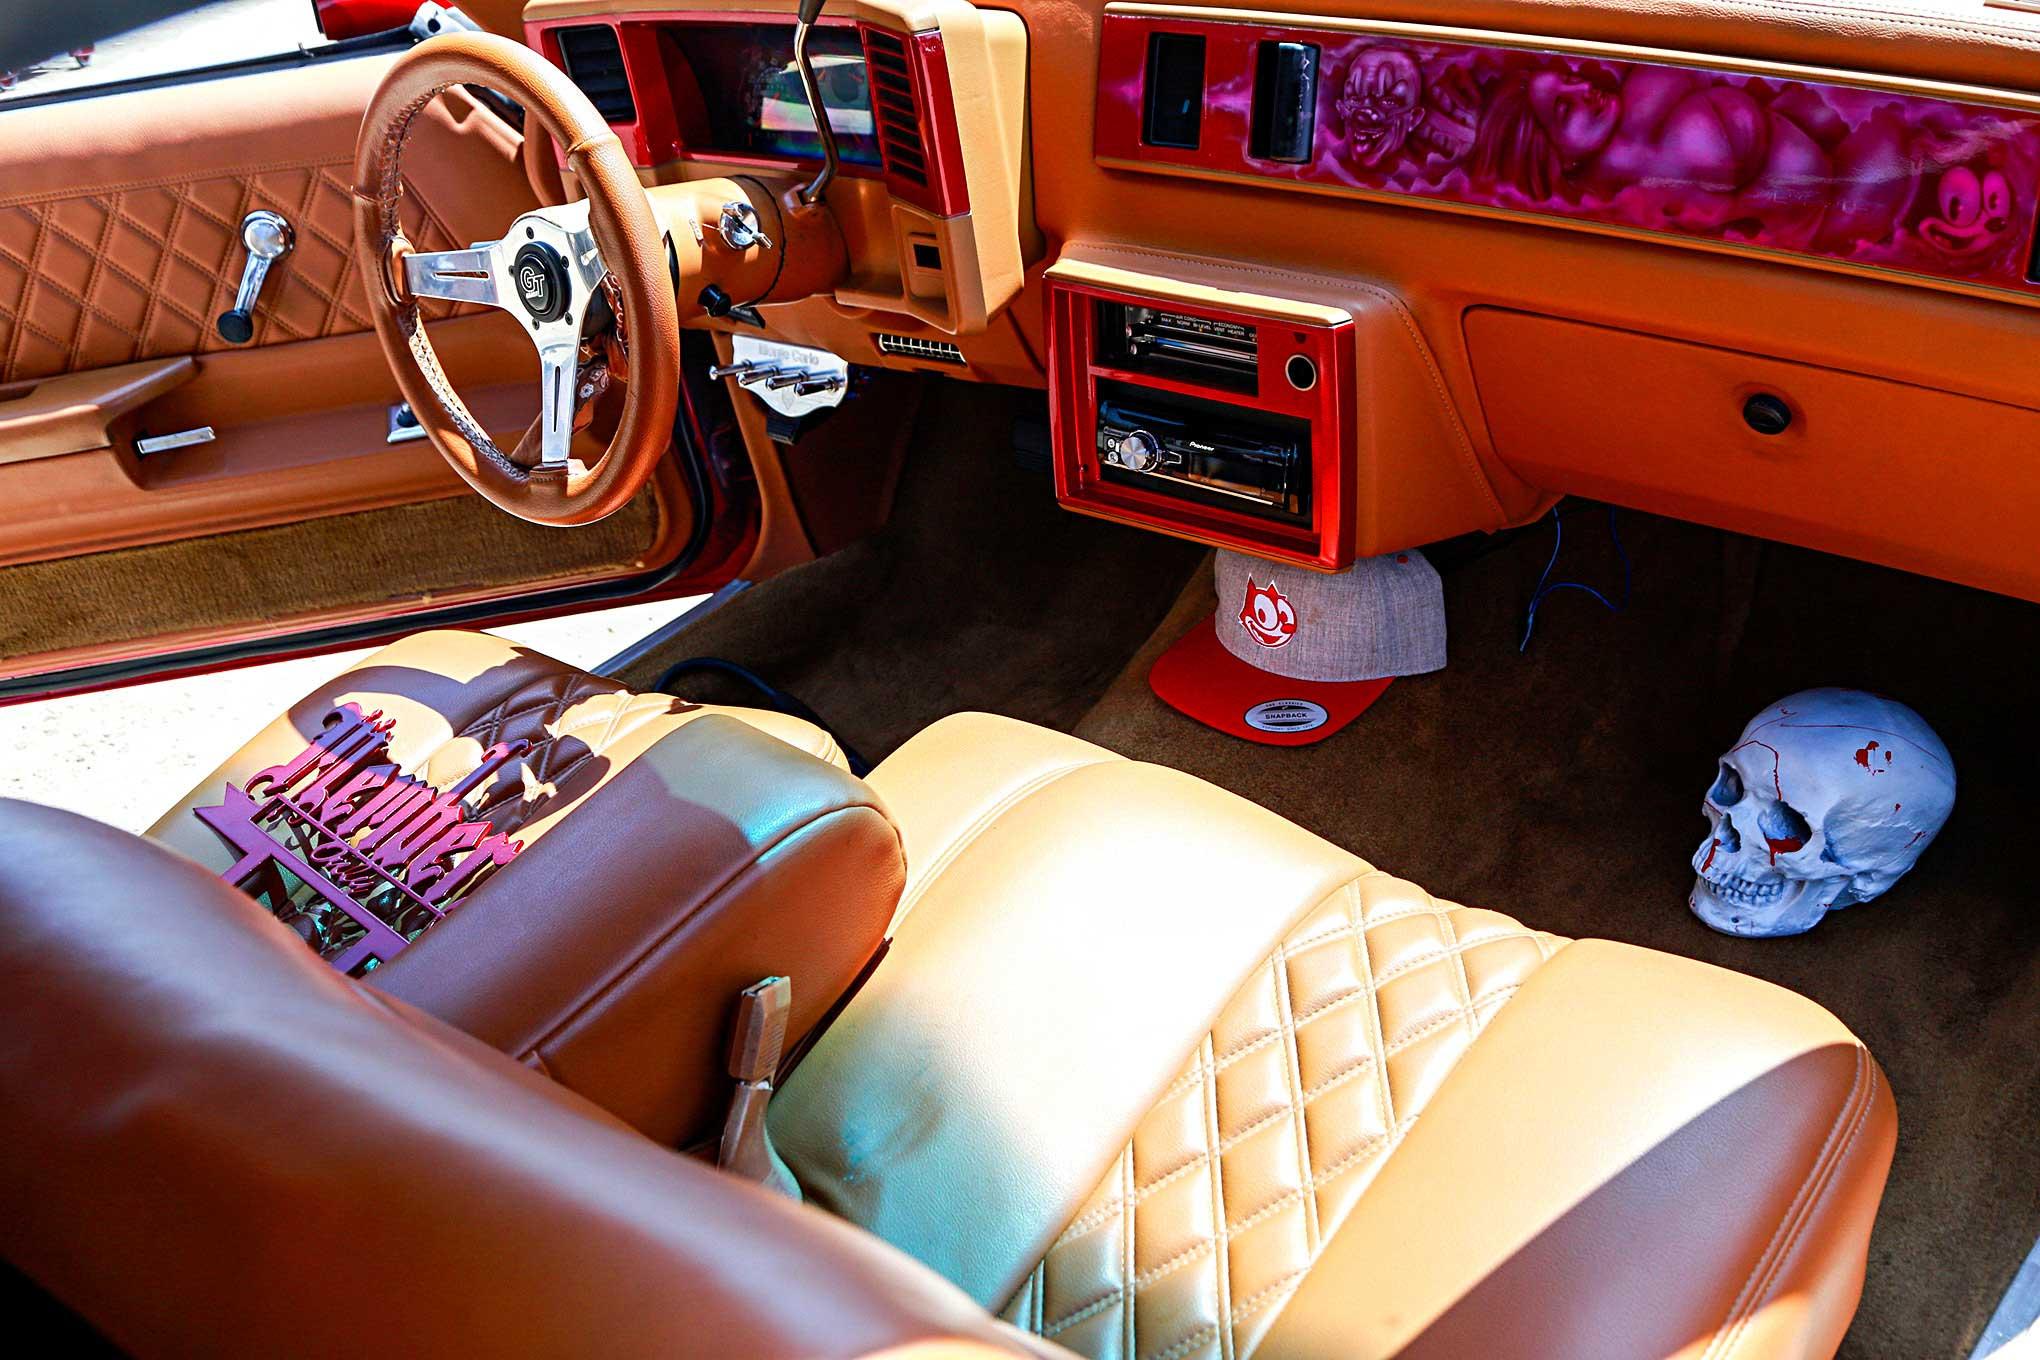 1987 Chevrolet Monte Carlo Peanut Butter Vinyl Interior